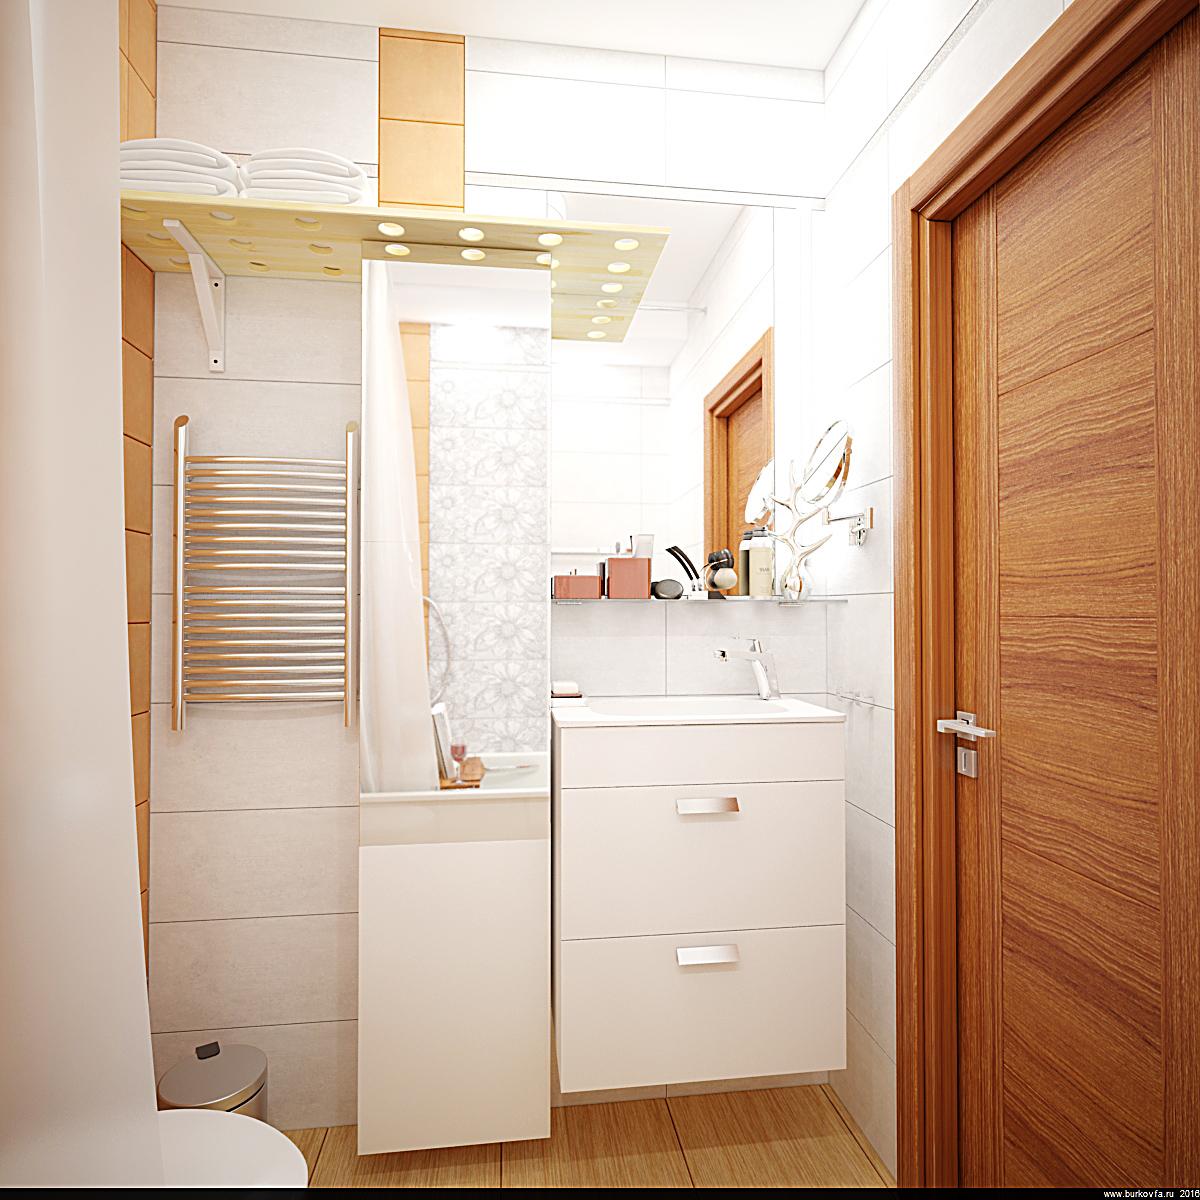 бюджетный интерьер ванной комнаты